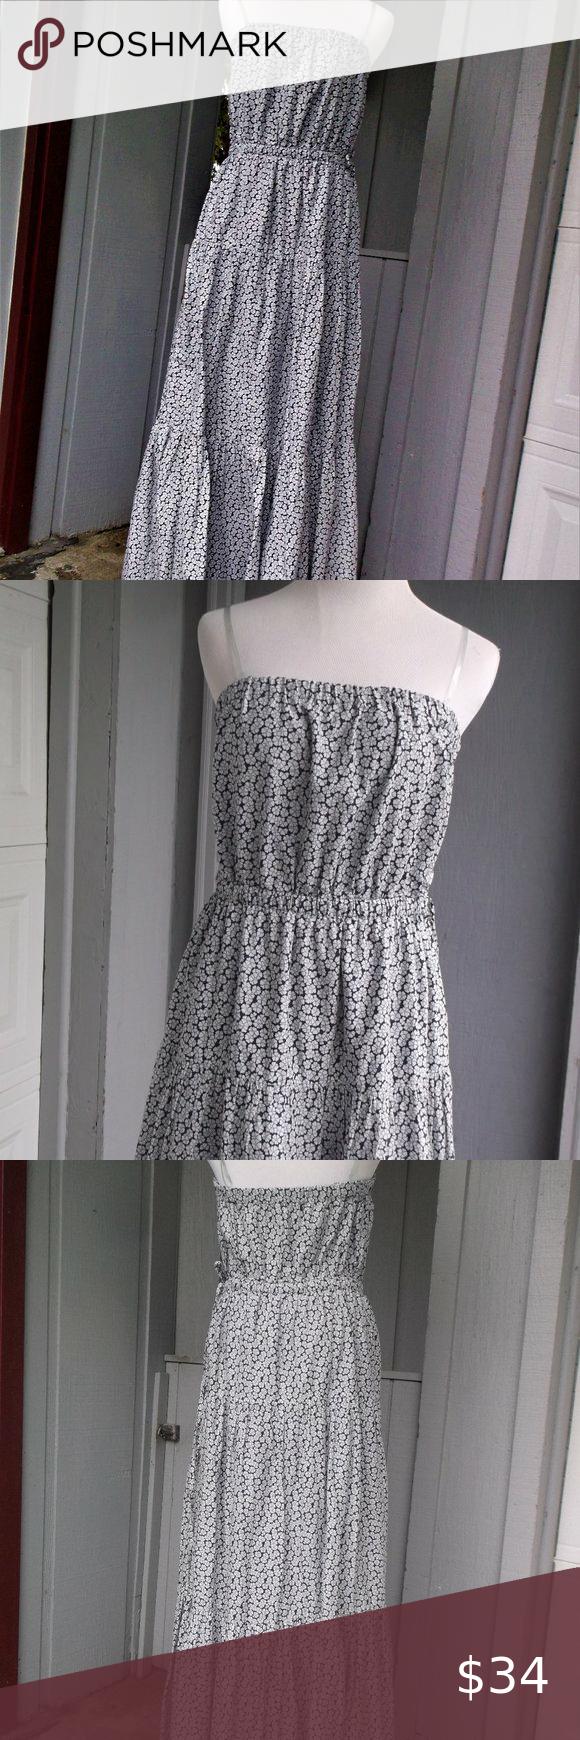 Gap 3 Tiered Ruffle Flower Ajust Strap Maxi Dress Ruffle Flower Gap Dress Maxi Dress [ 1740 x 580 Pixel ]